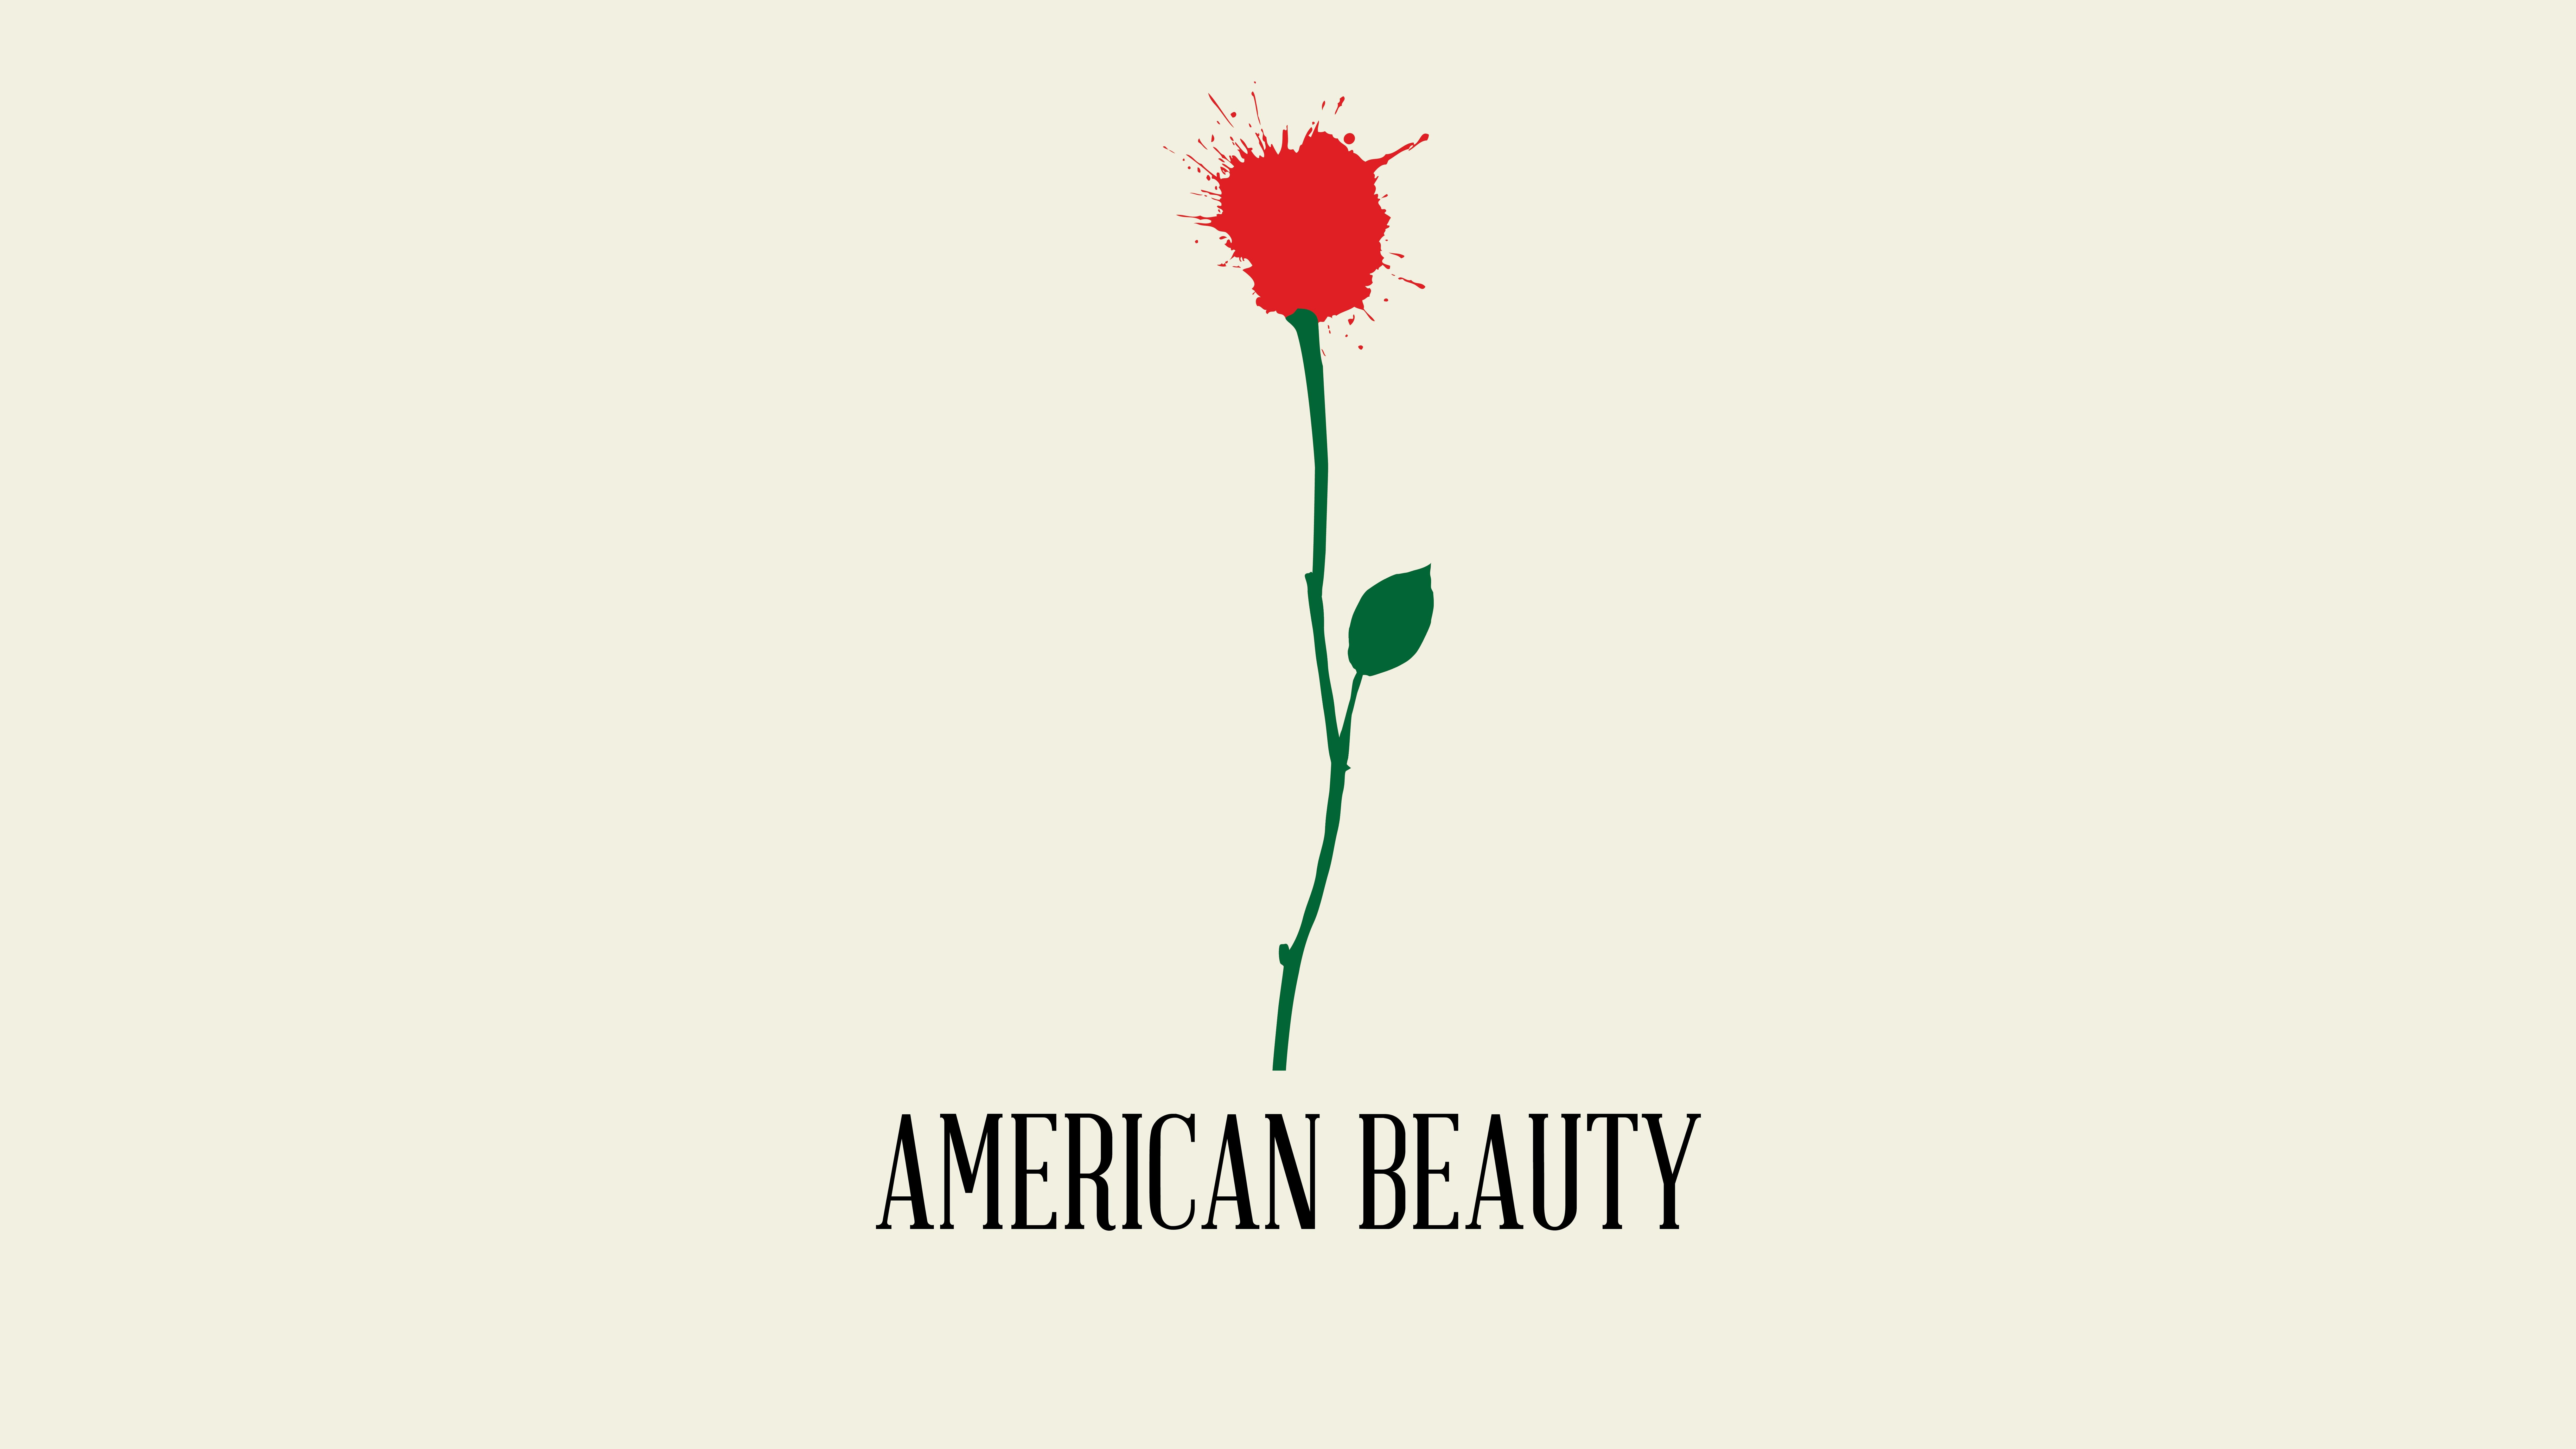 American Beauty 8k Ultra HD Wallpaper Background Image 9900x5569